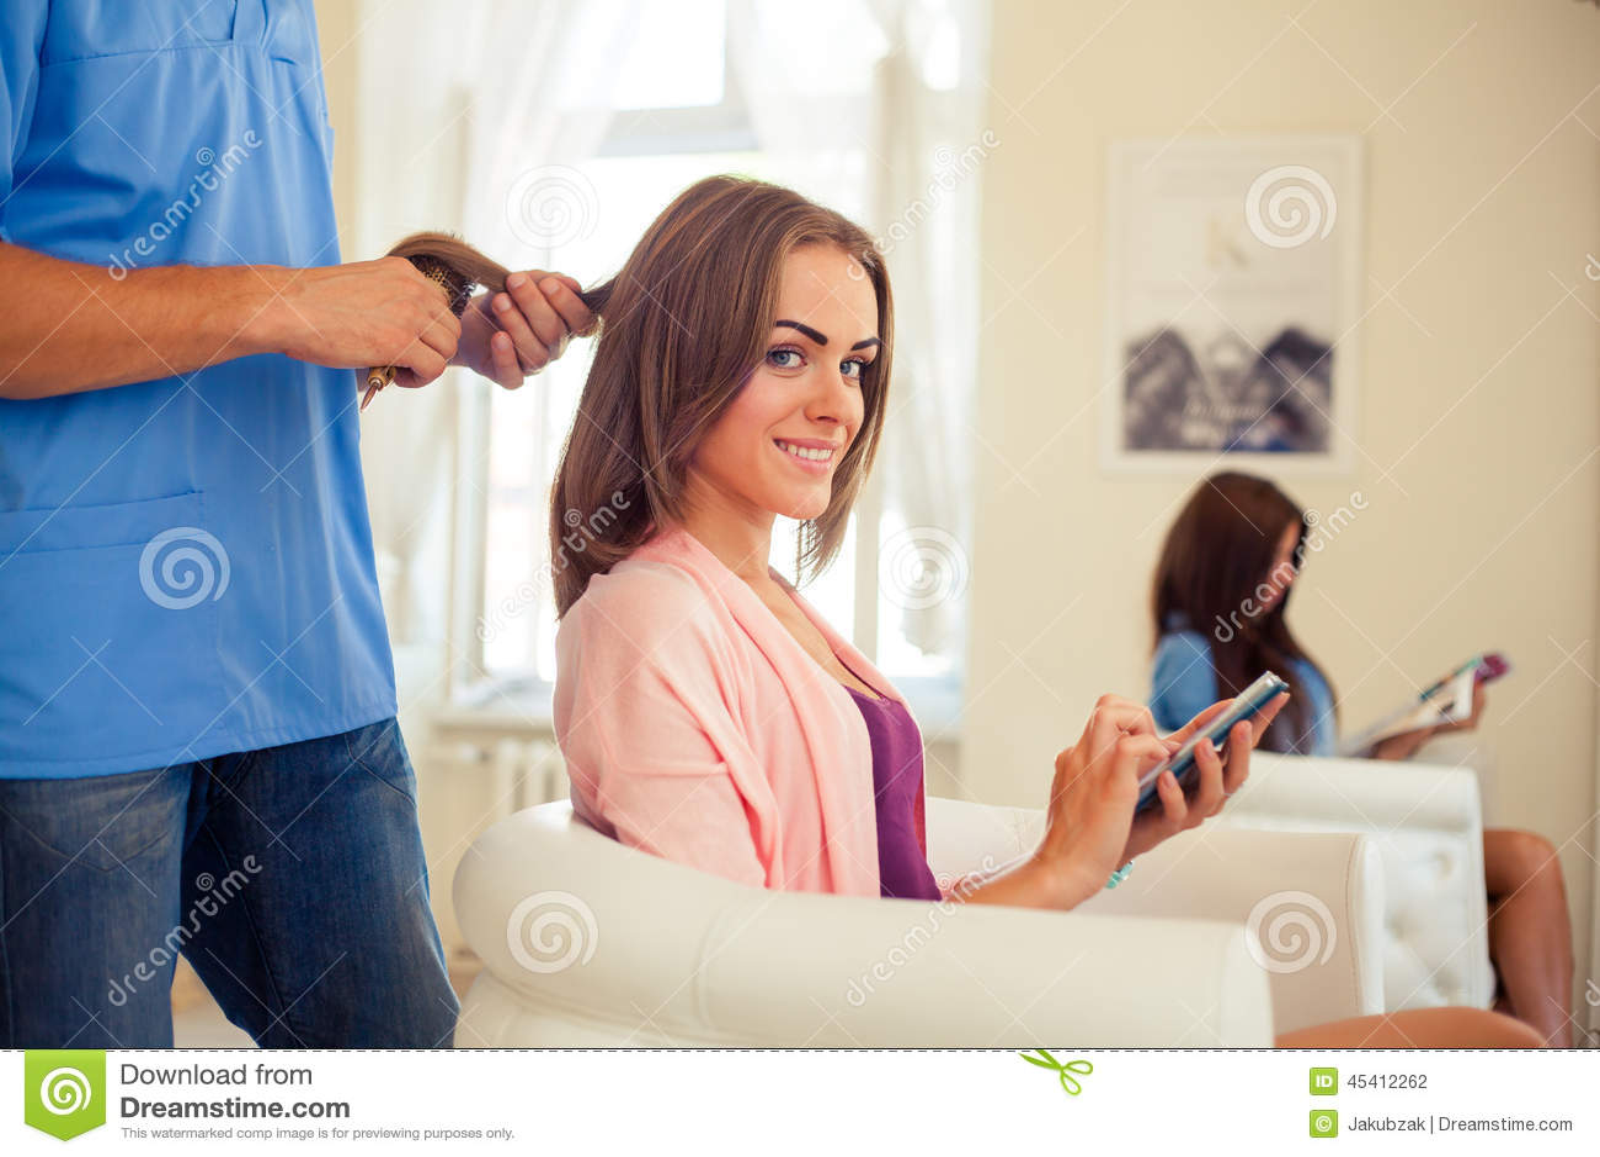 Fashion Beauty Salon